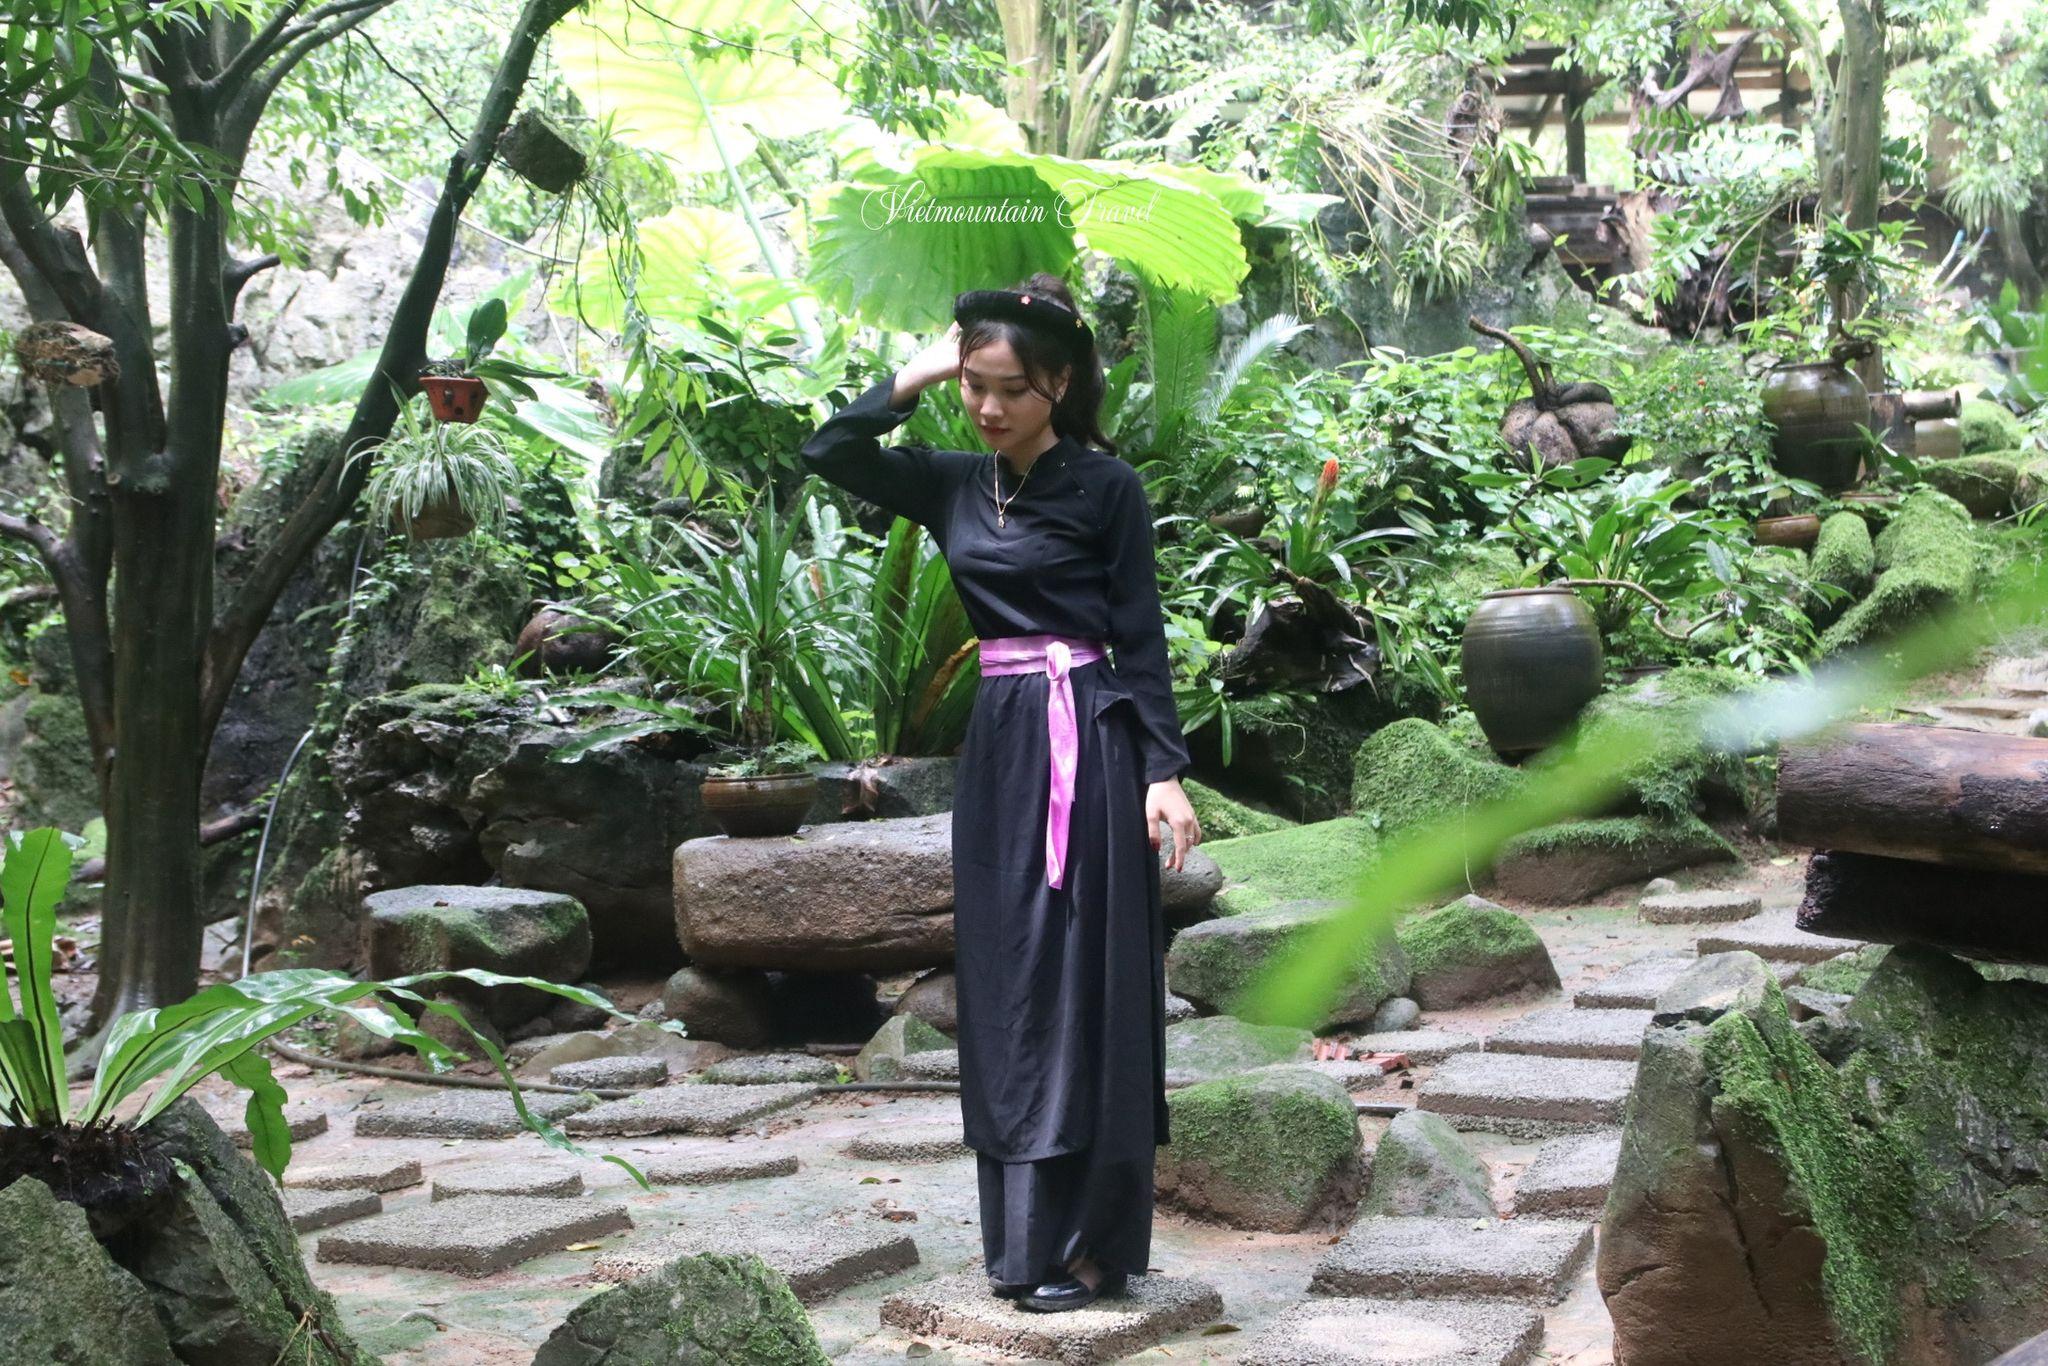 tour-bac-son-trecking-na-lay-mua-lua-chin-2-ngay-1-dem-du-lich-nui-viet-vietmountain-travel15